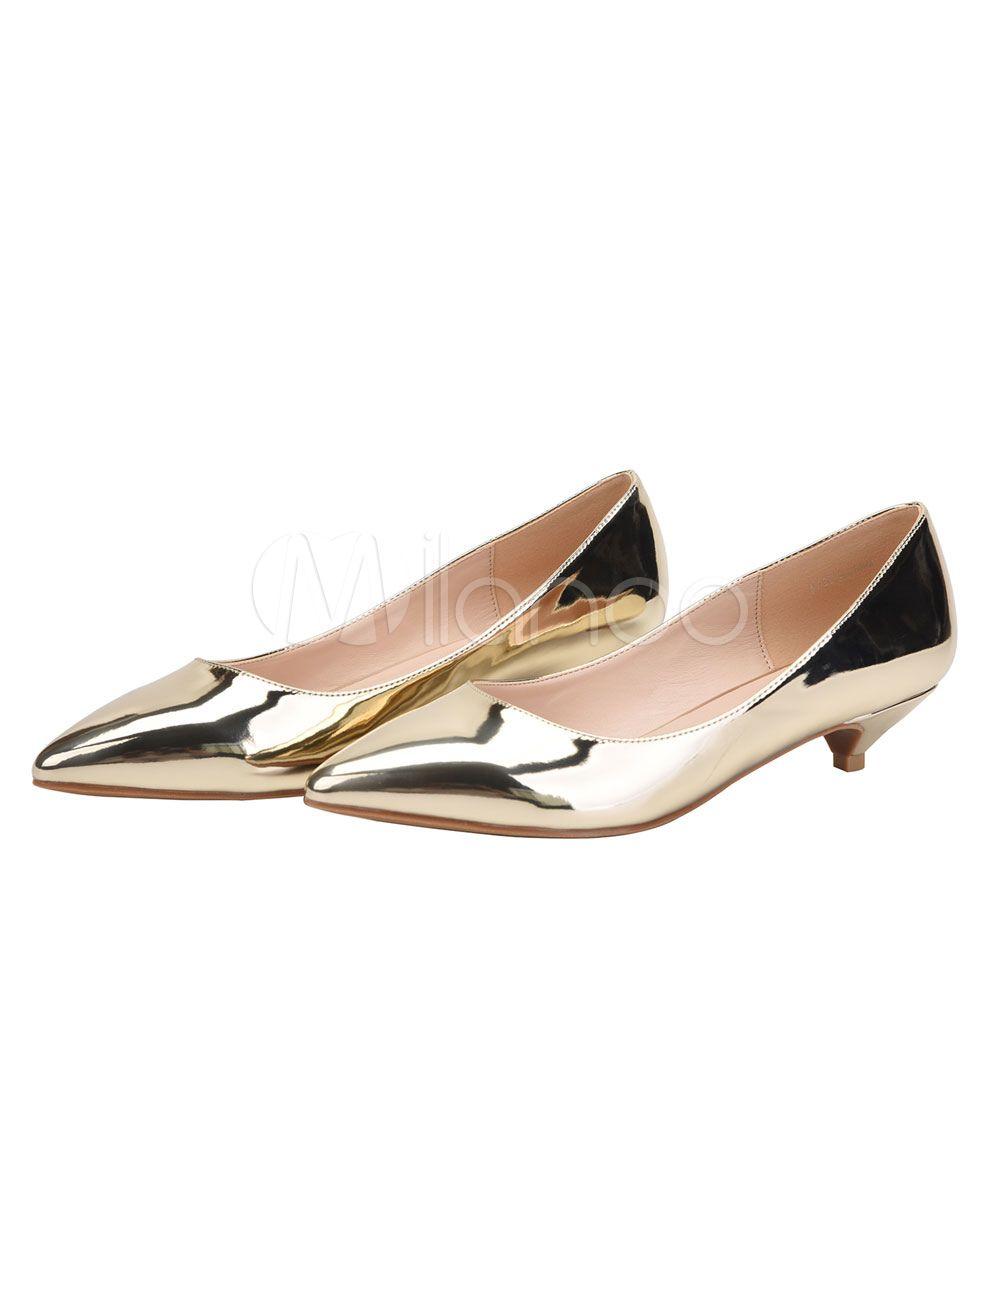 Silver Dress Shoes Kitten Heel Pumps Plus Size Pointed Toe Slip On Shoes Milanoo Com Kitten Heel Shoes Silver Dress Shoes Kitten Heel Pumps